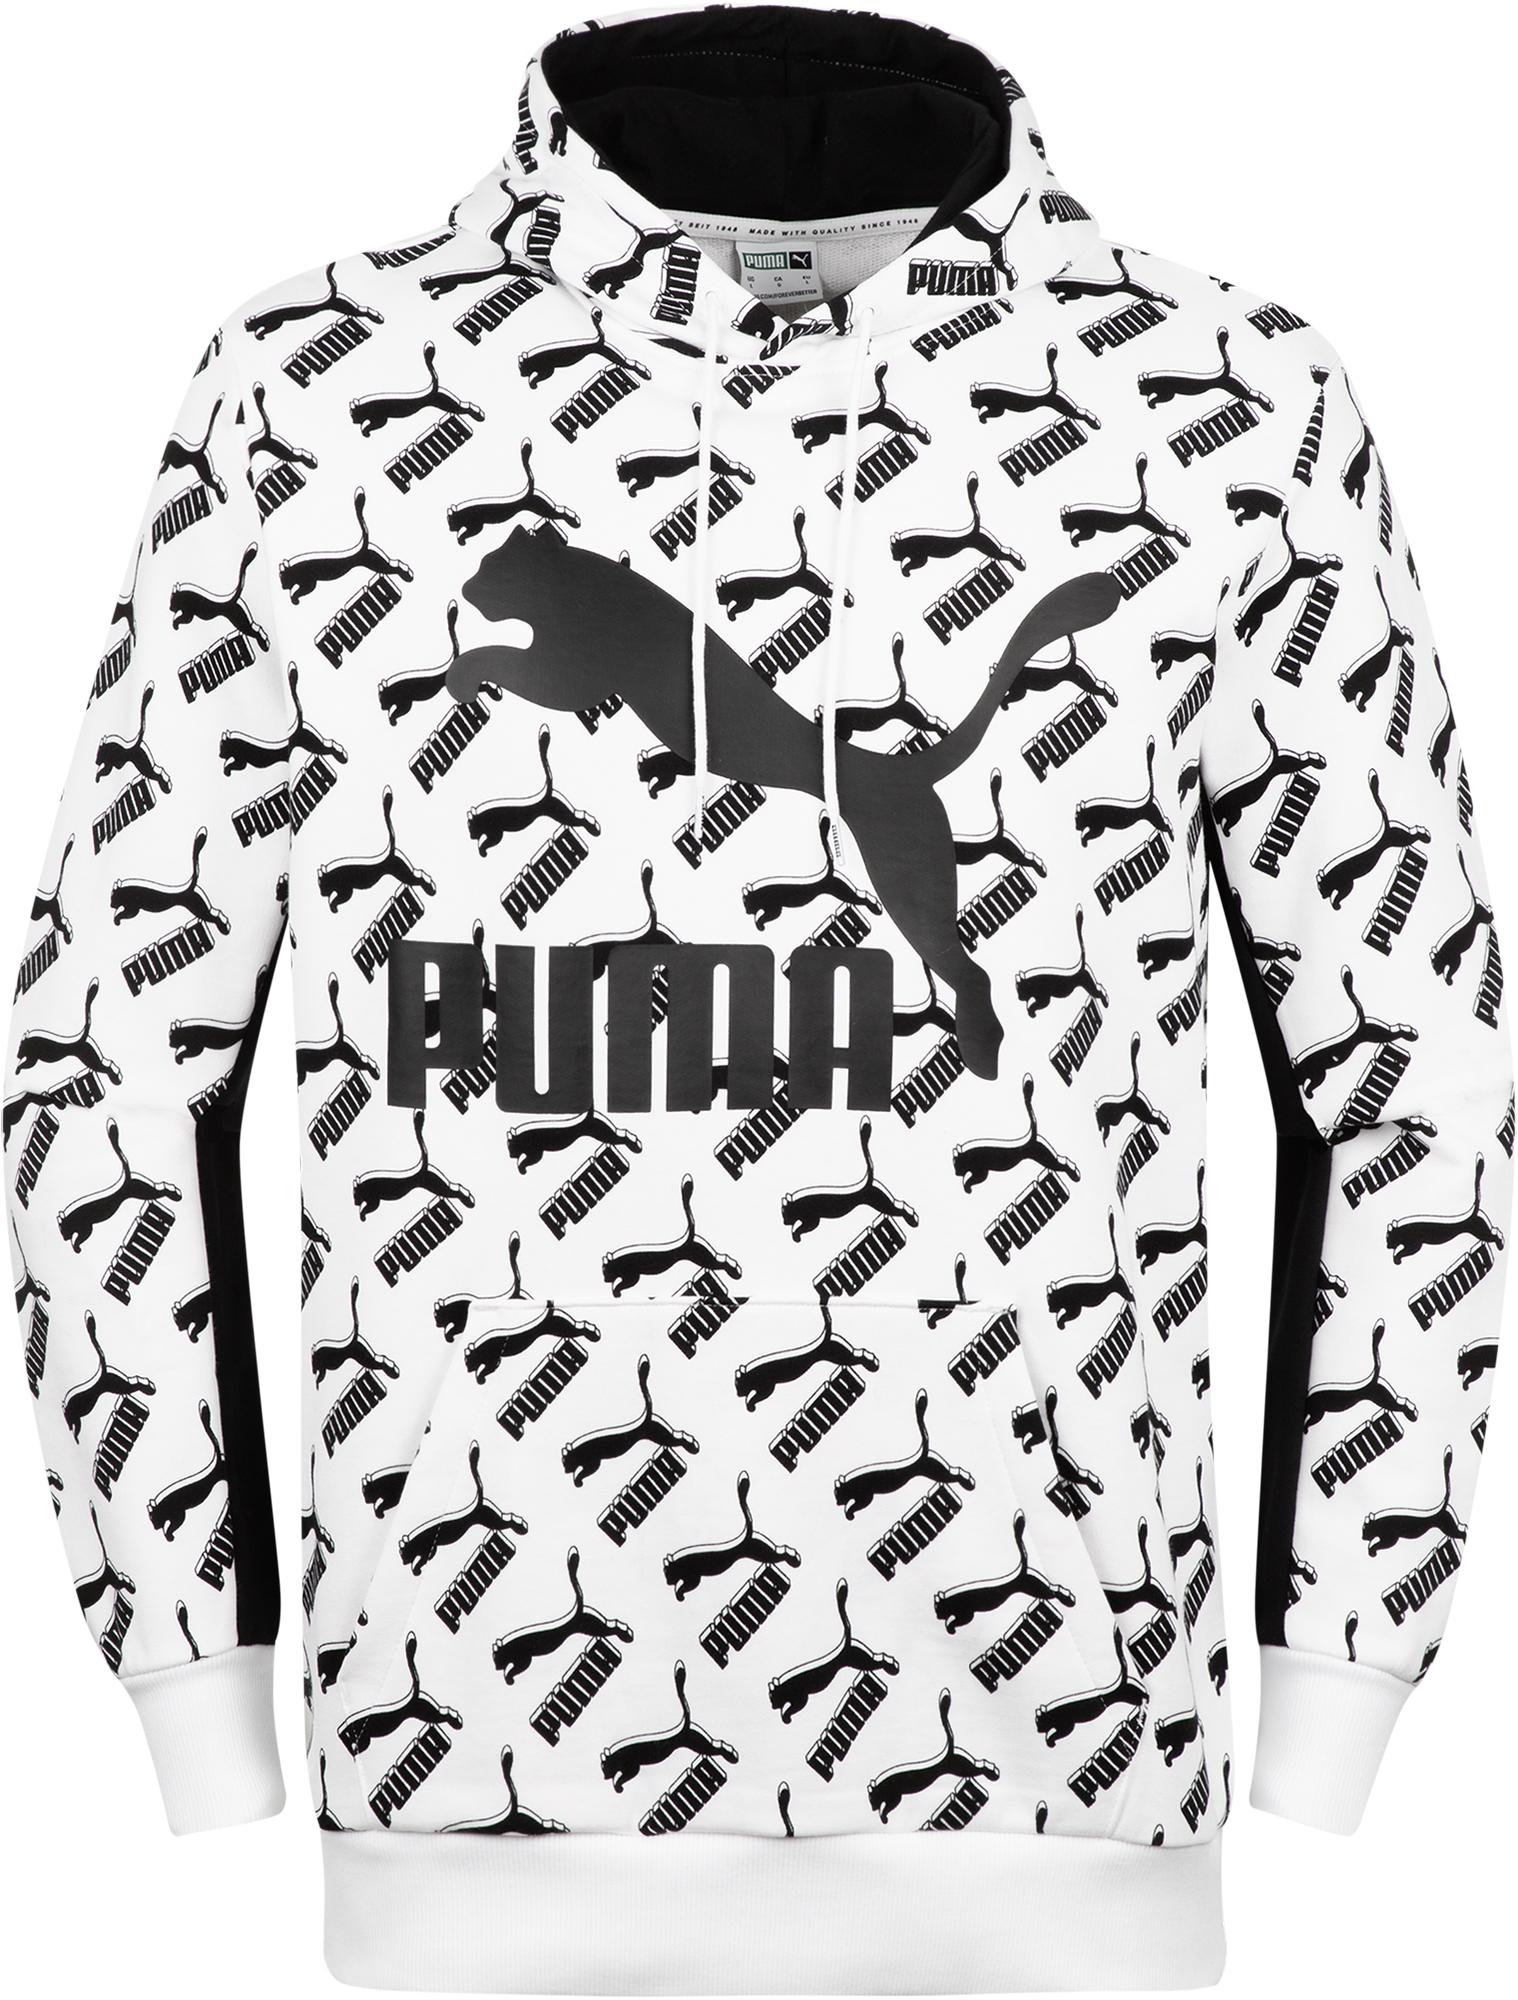 Puma Худи мужская Puma AOP Logo, размер 50-52 puma футболка мужская puma aop split tee размер 48 50